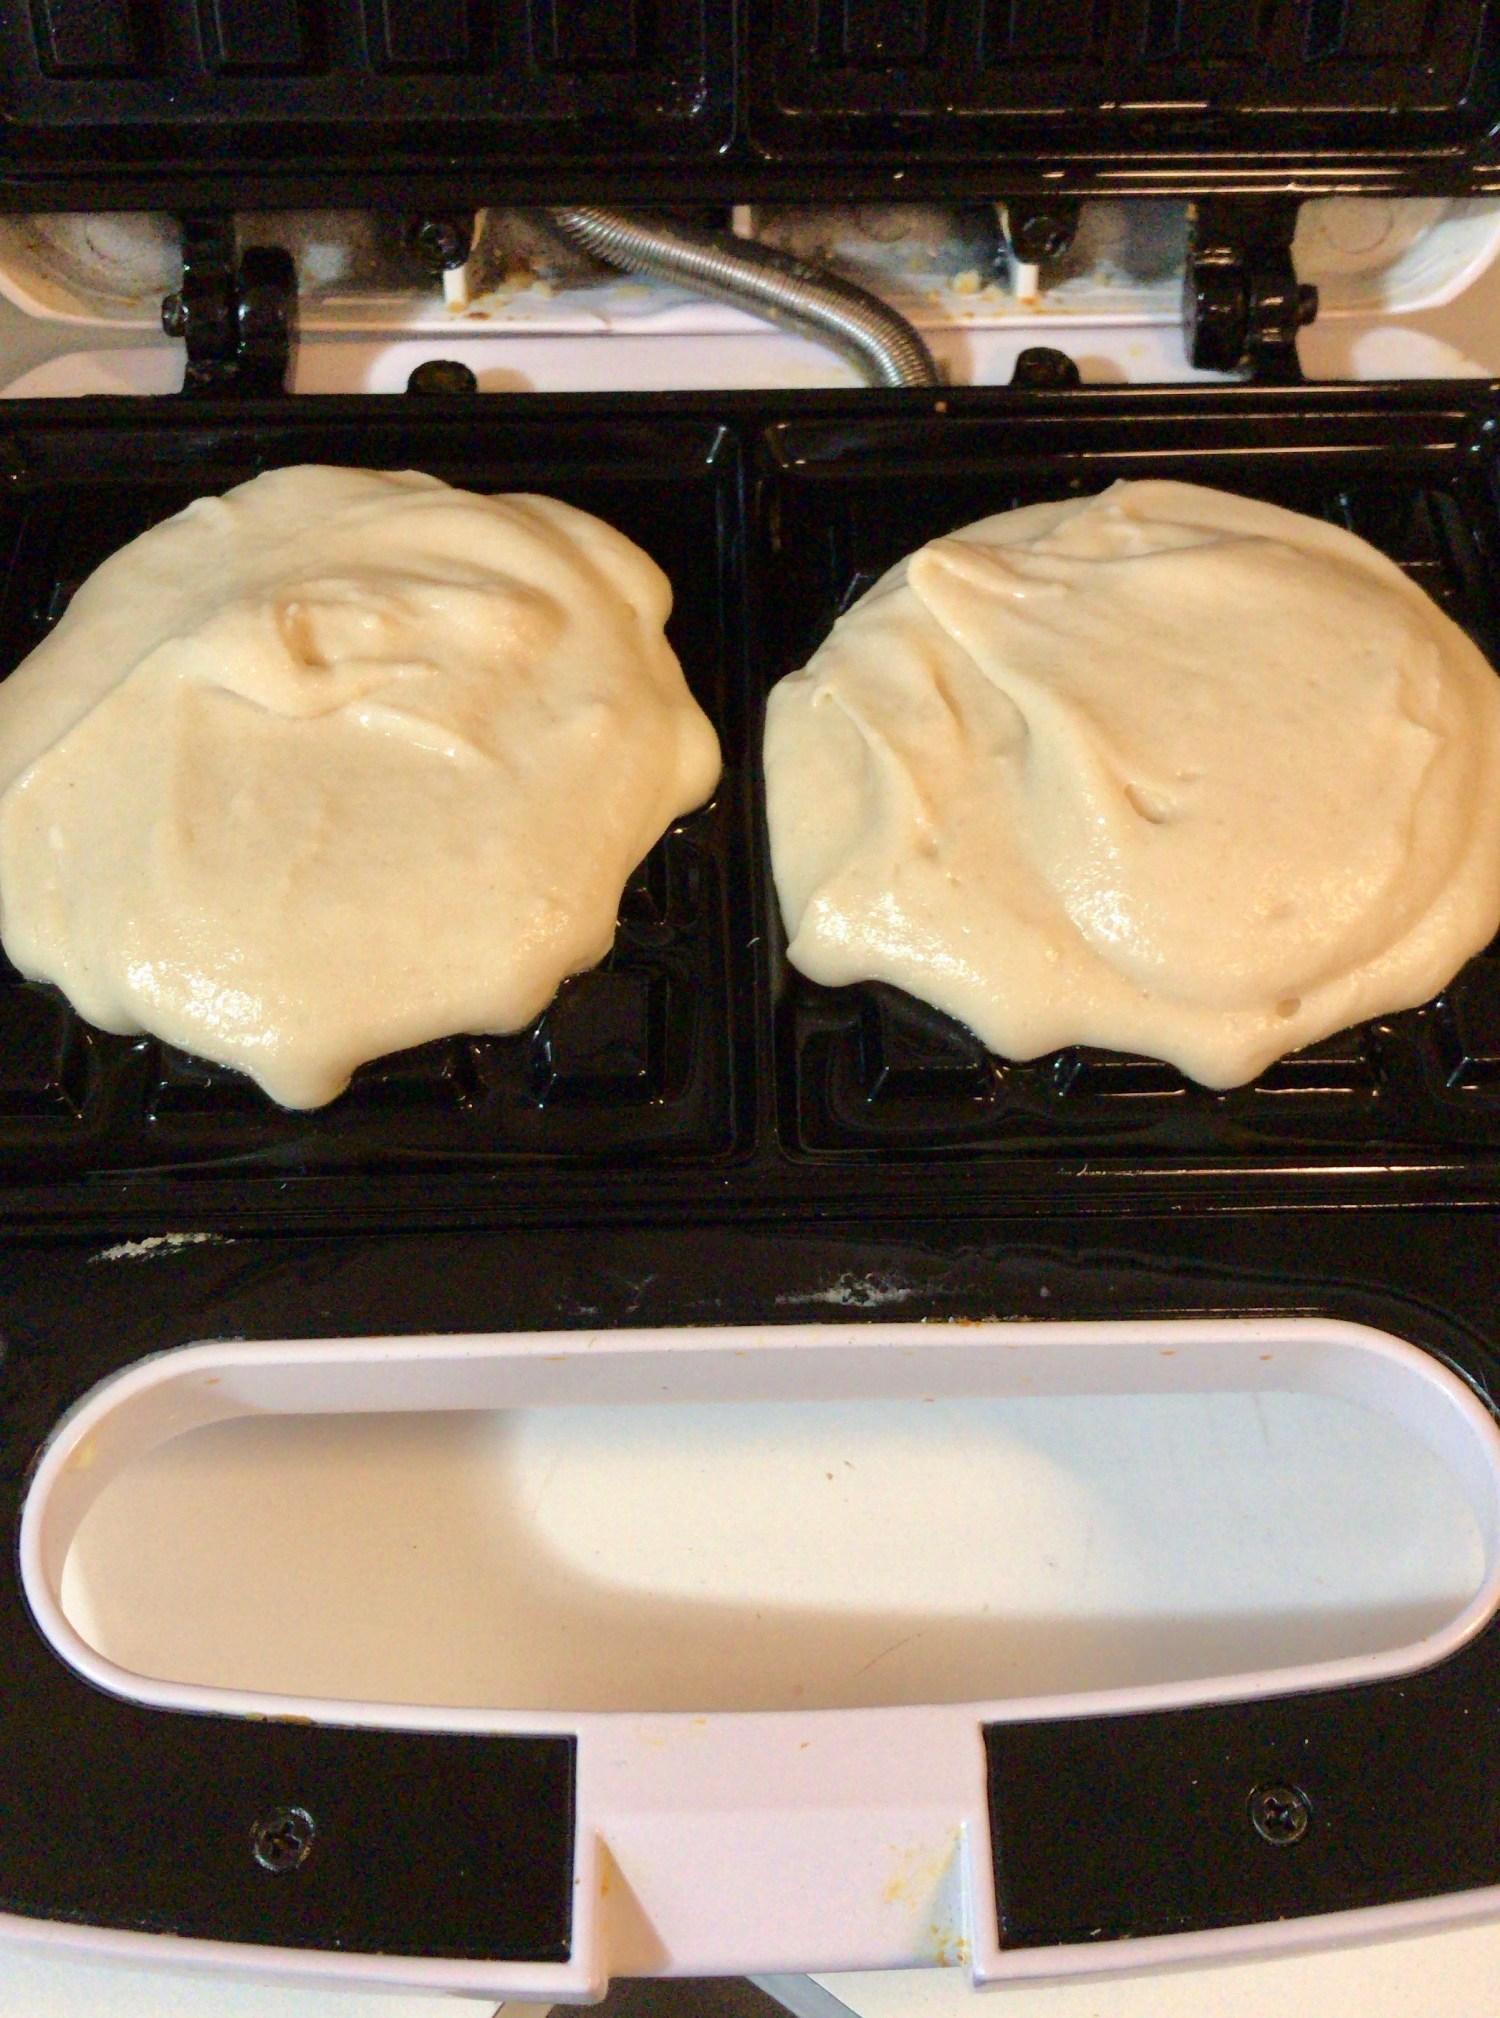 Waffle batter on waffle maker